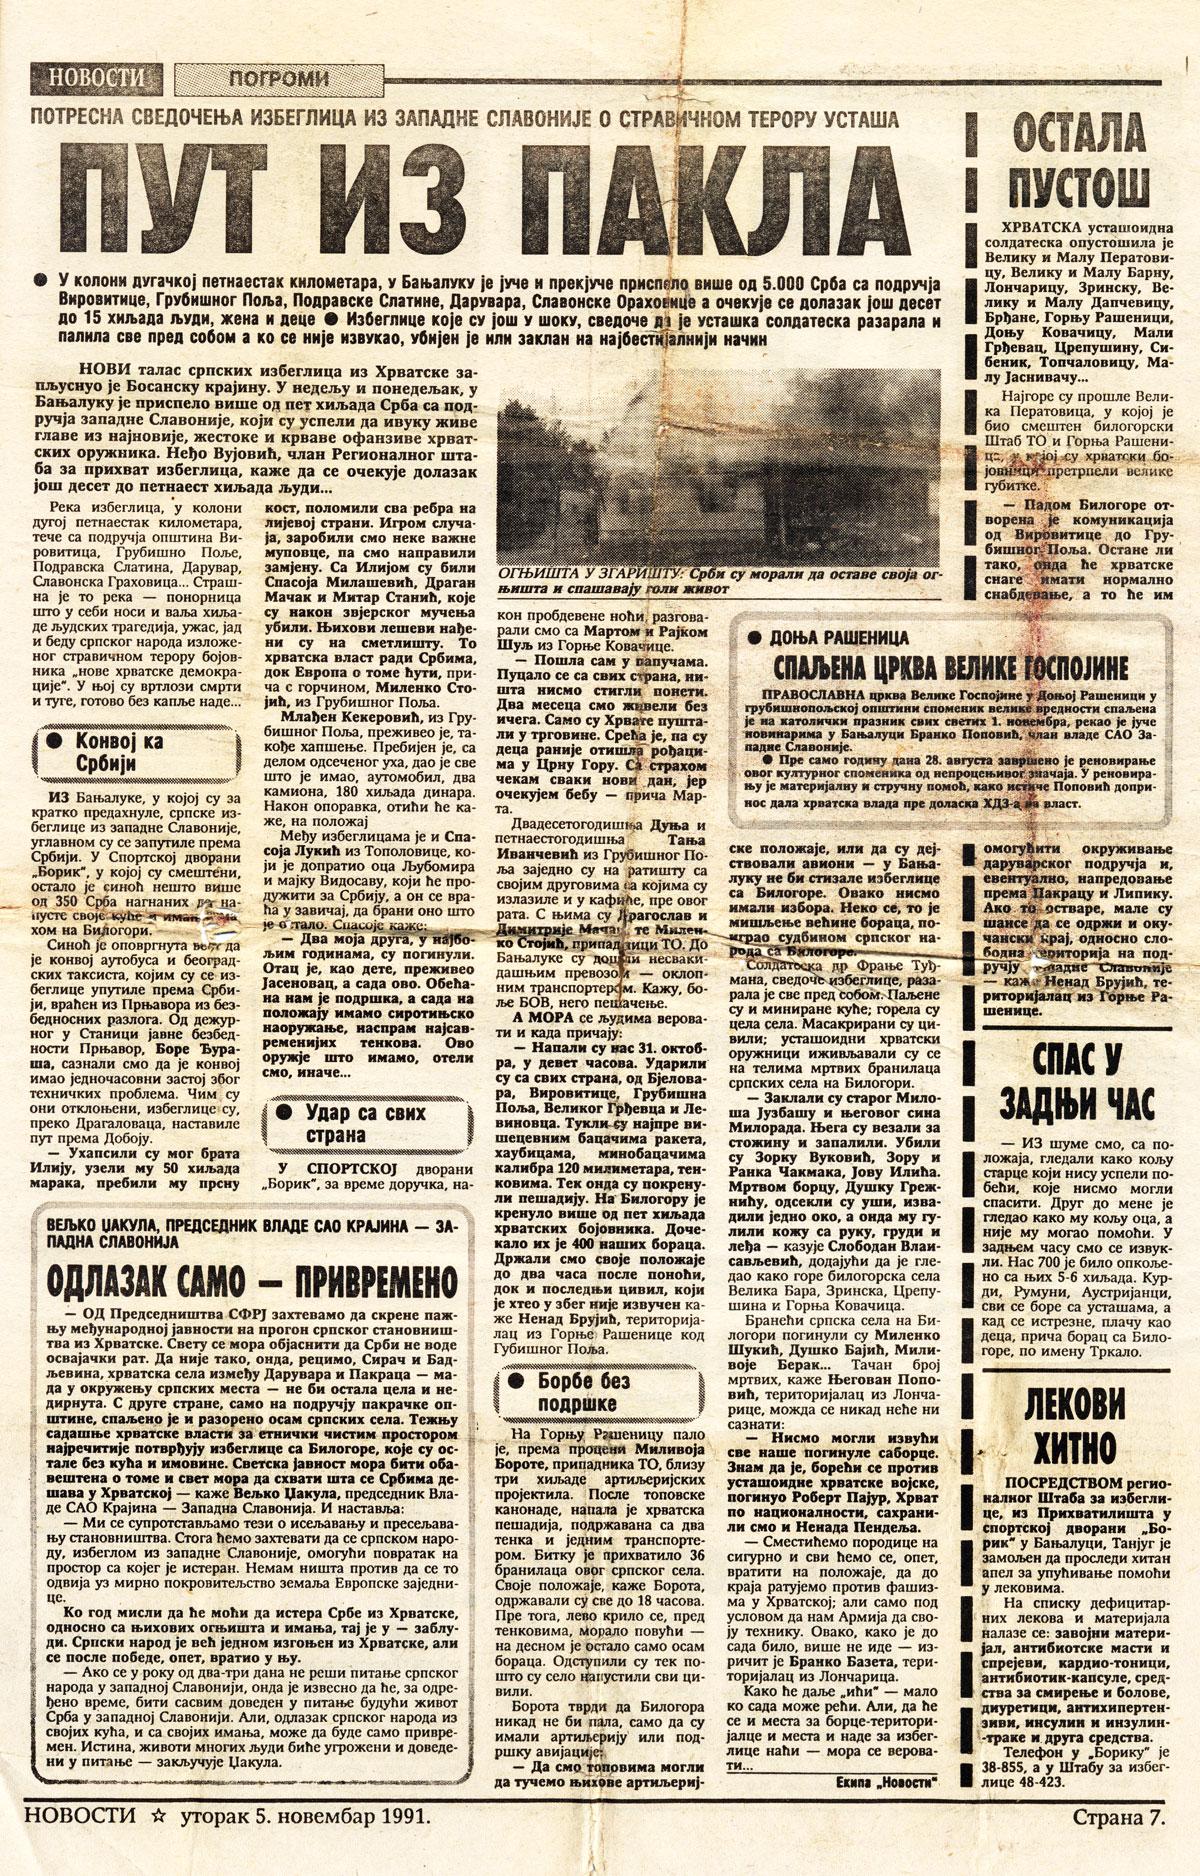 NOVOSTI - 5. novembar 1991.